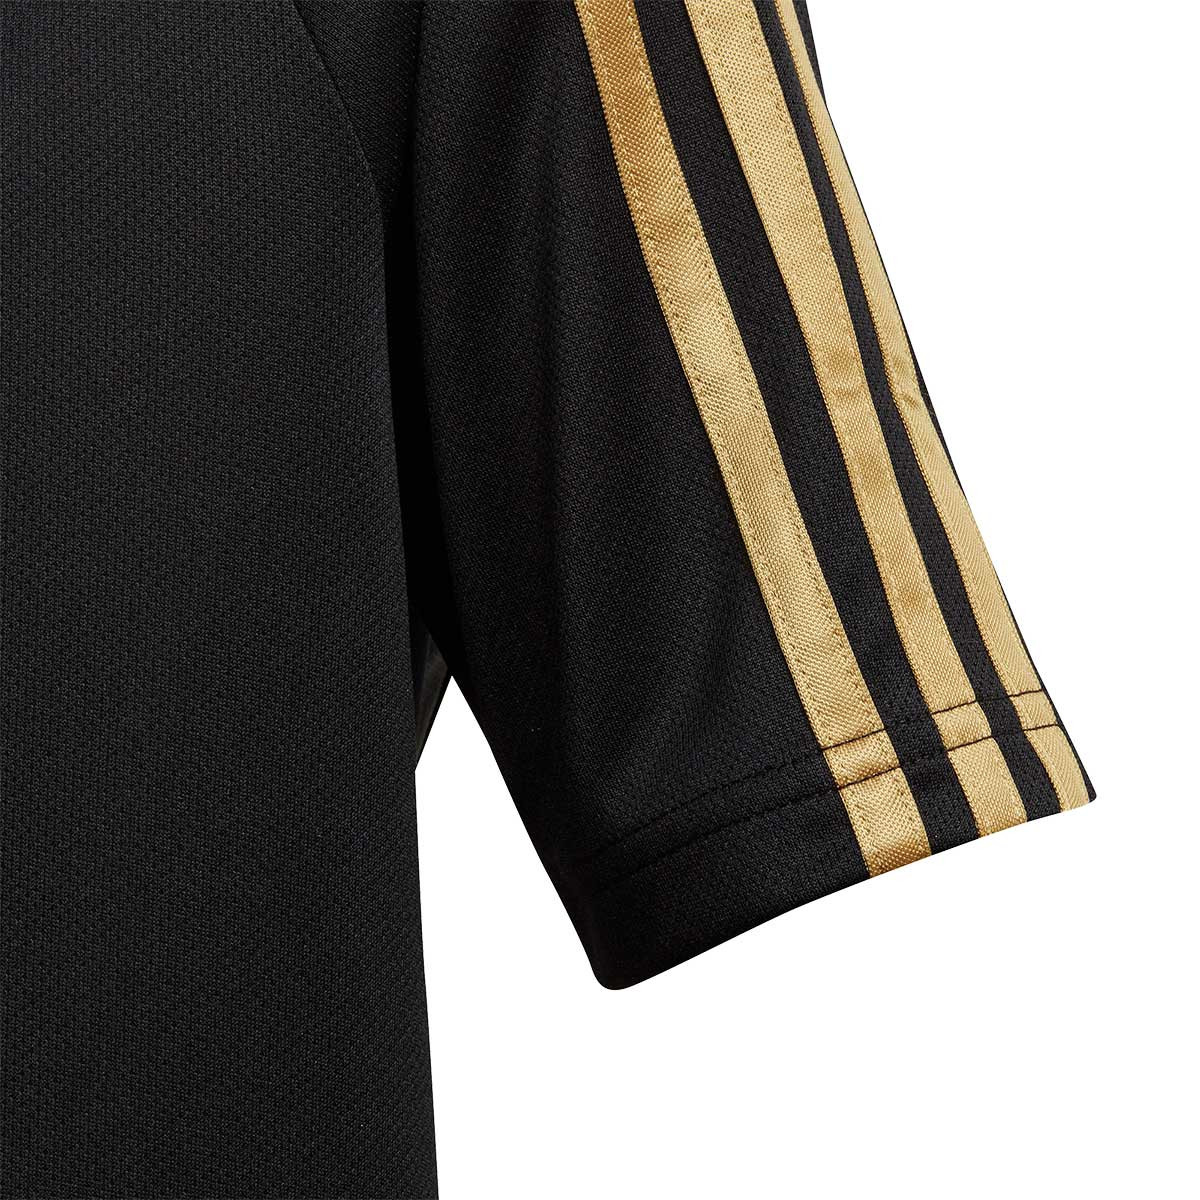 buy online 6c8c5 1d996 Camiseta Real Madrid Training 2019-2020 Niño Black-Dark football gold